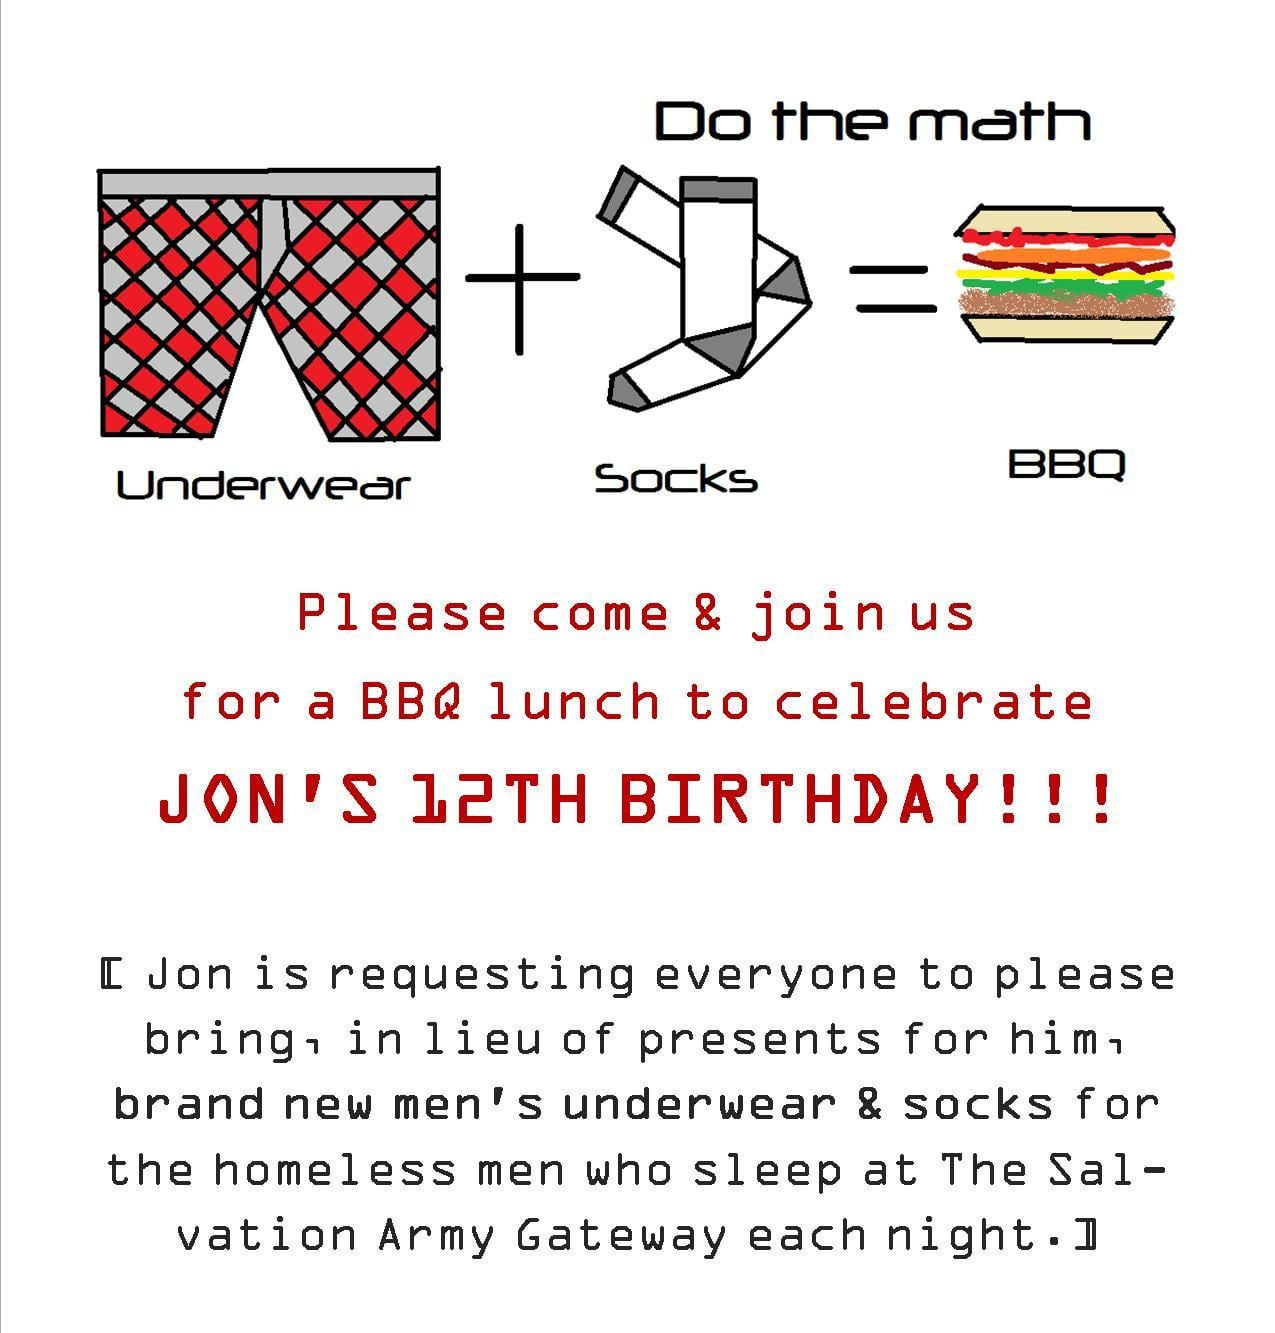 New Year Party Invitation Letter Format | Invitationjpg.com